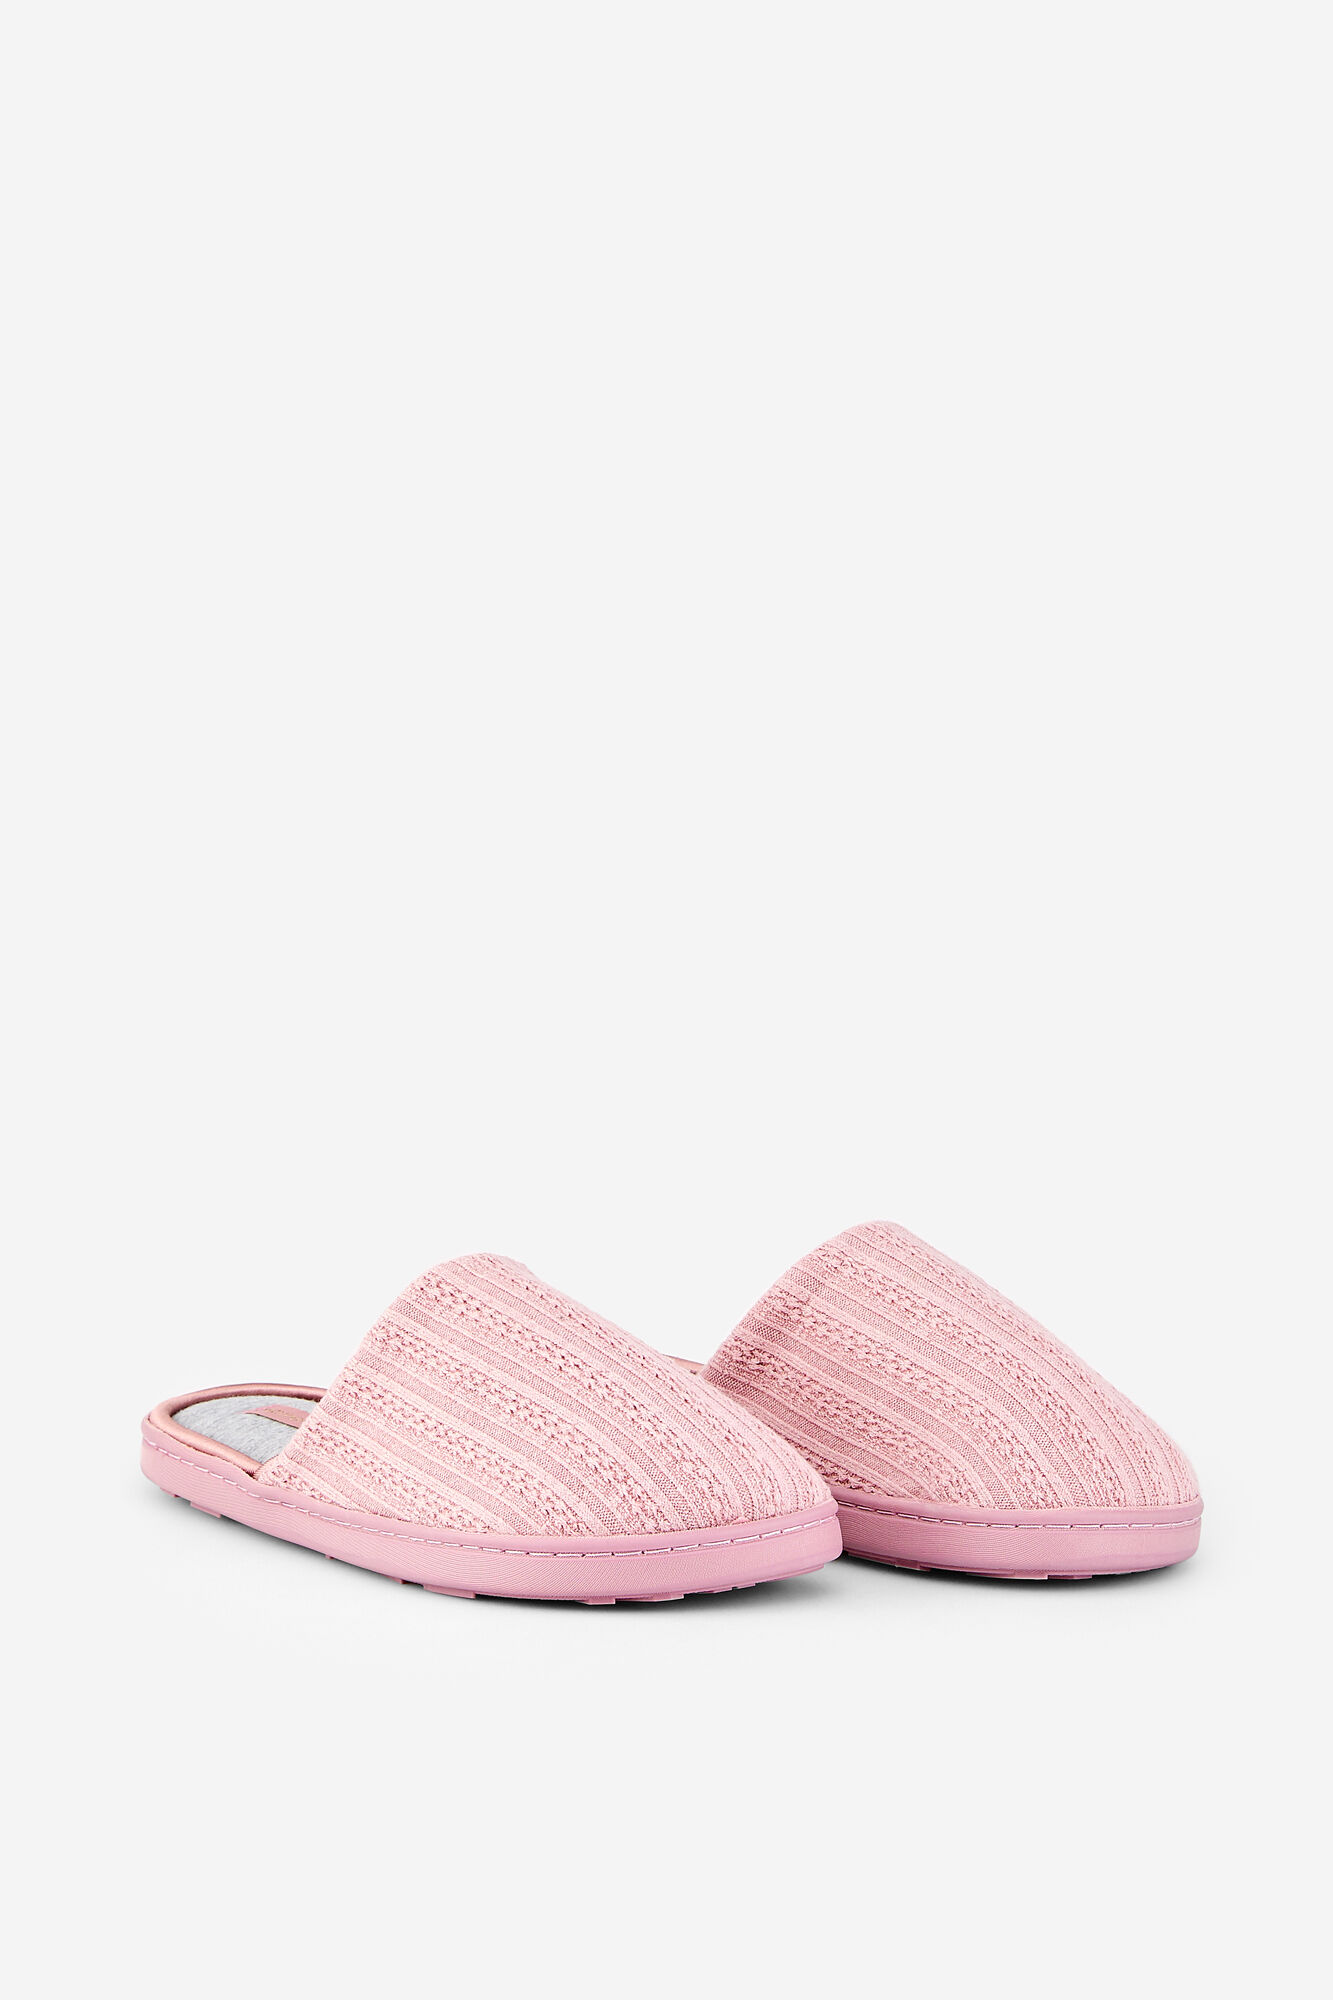 Outlet De Zapatos MujerFifty Outlet De Zapatos n0P8wOk